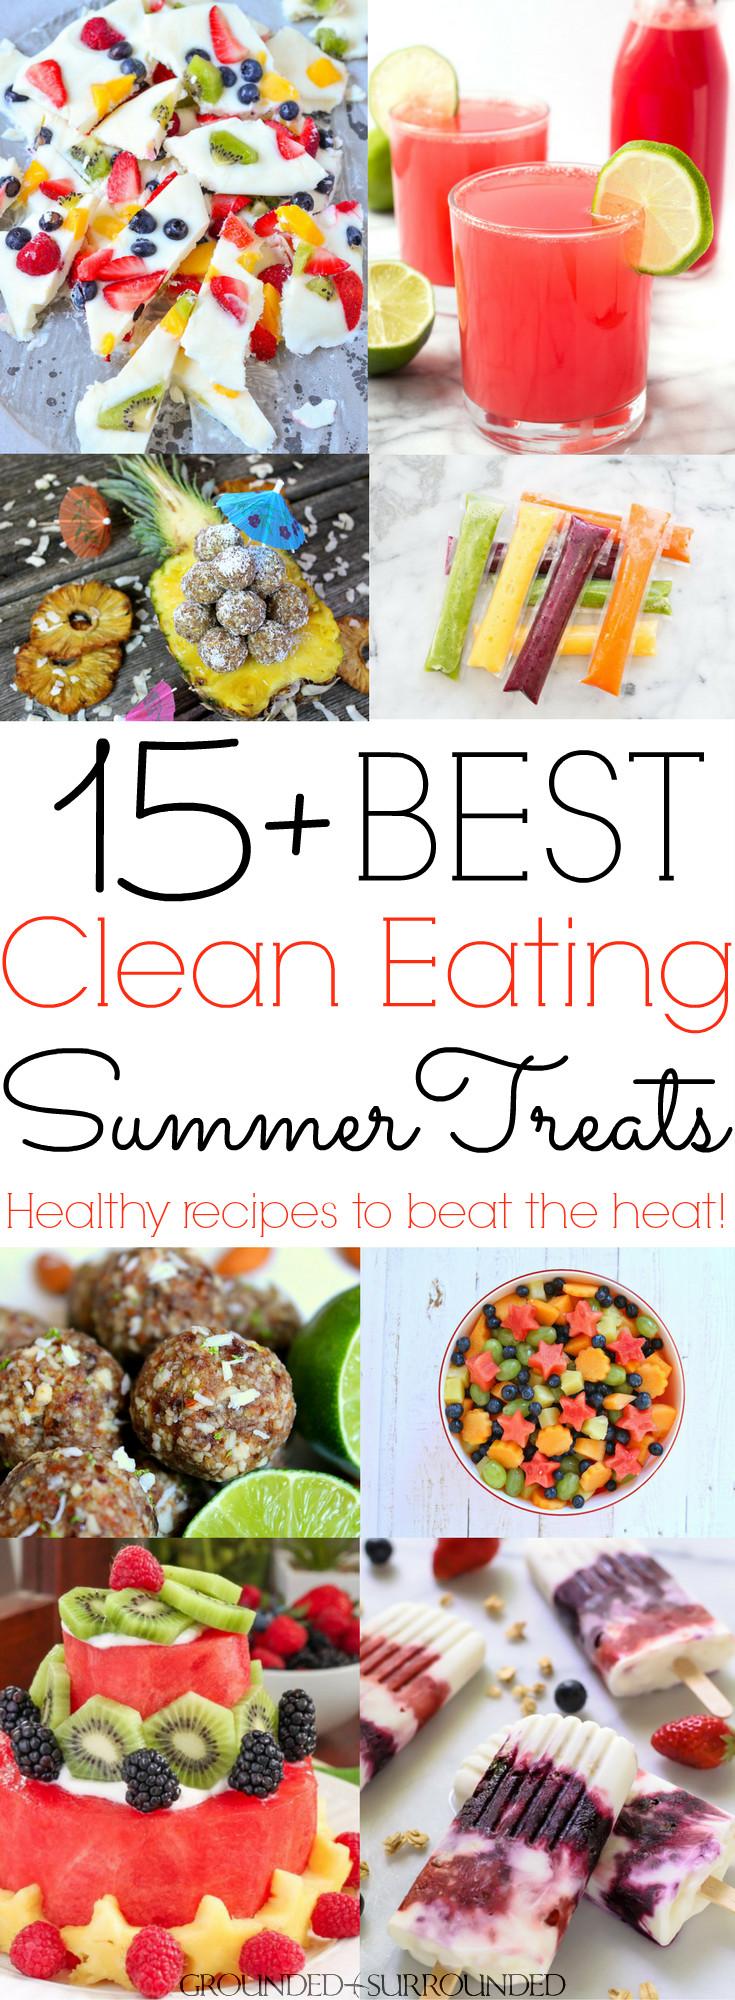 Healthy Summer Snacks  15 Best Clean Eating Summer Treats